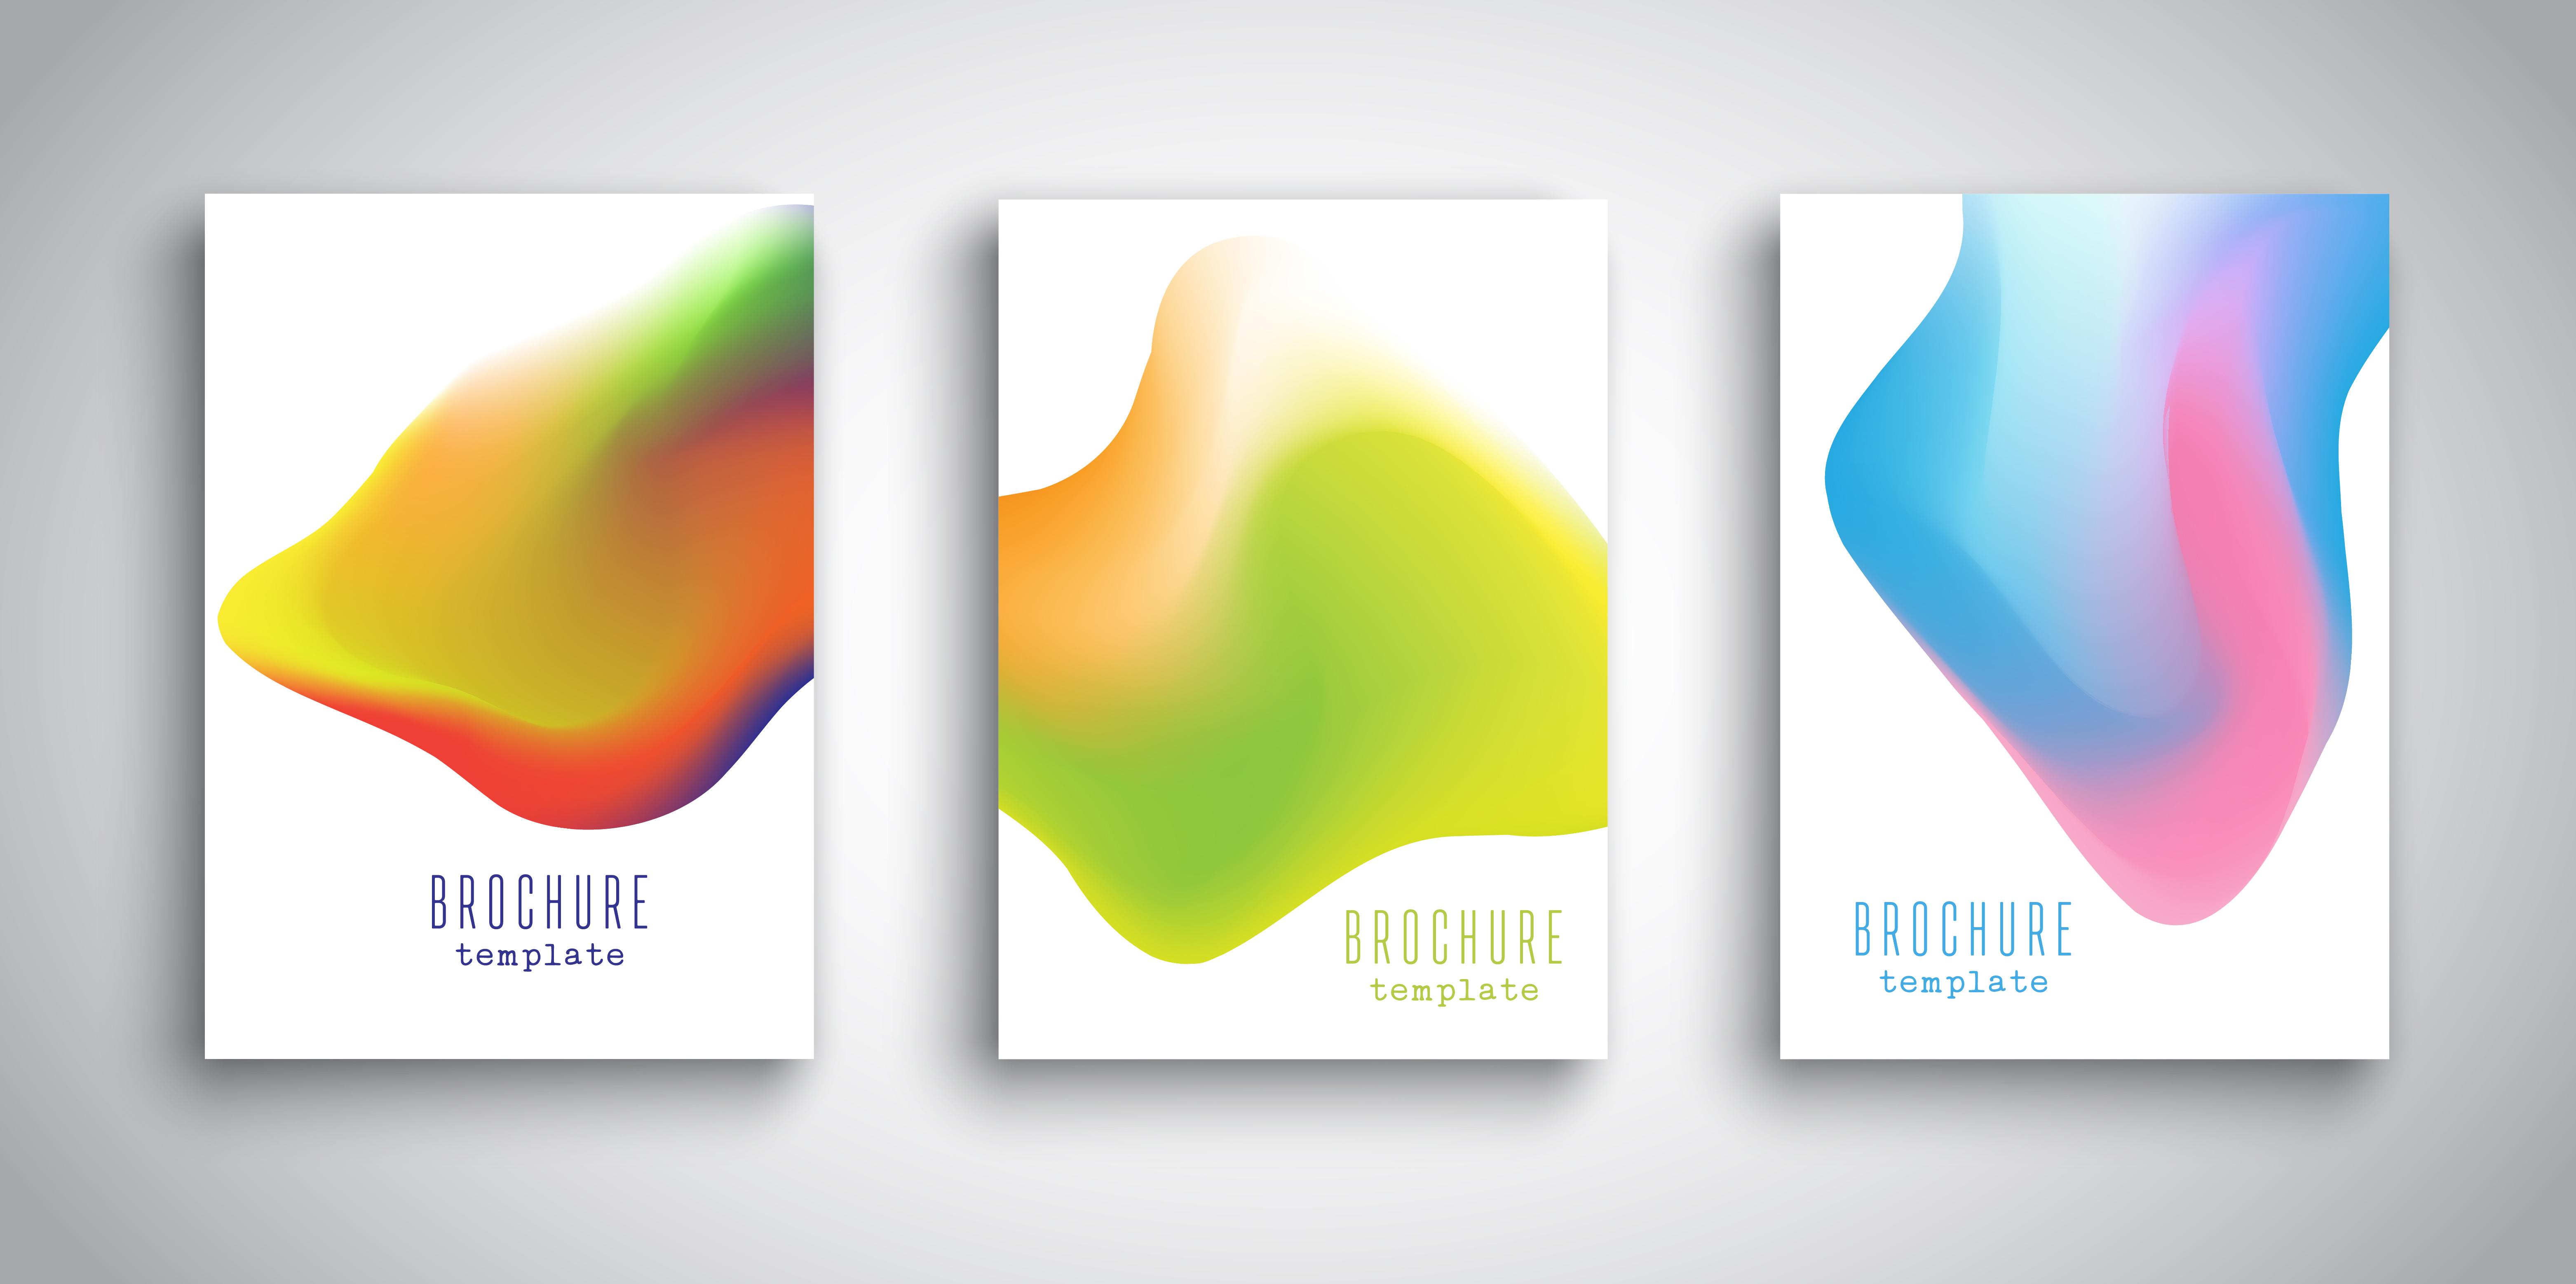 D Brochure Free Vector Art Free Downloads - 3d brochure template